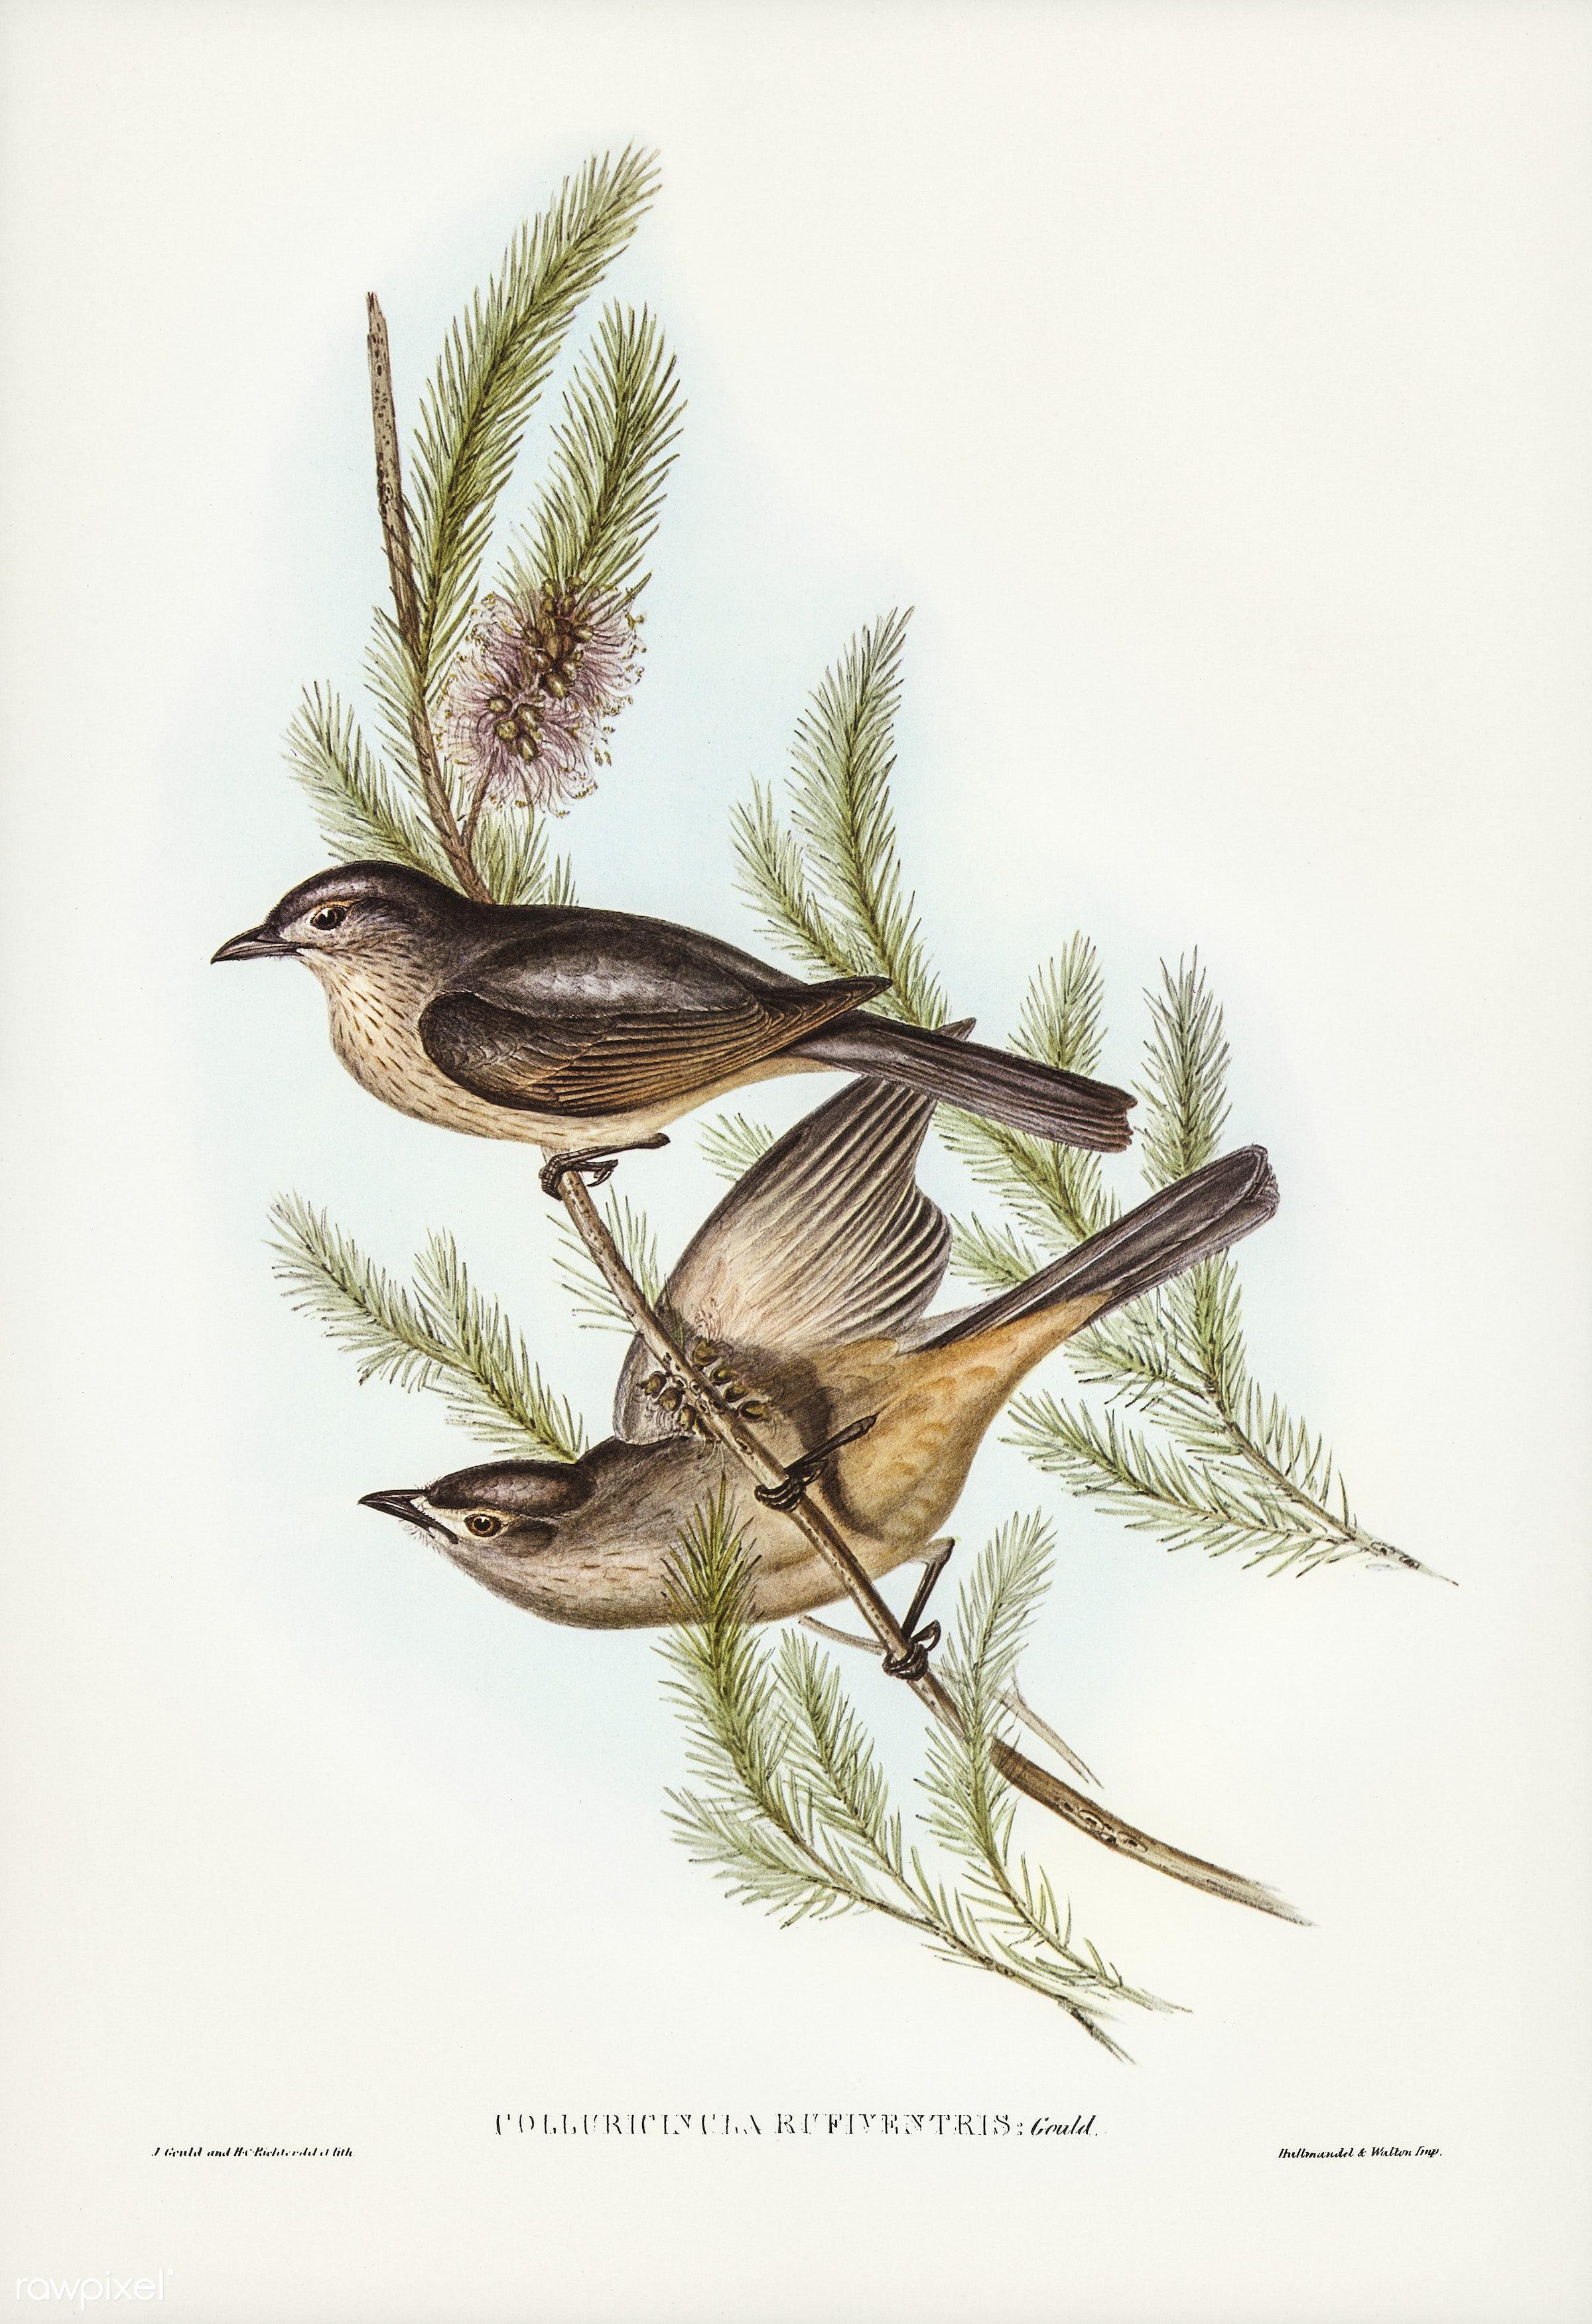 Buff-bellied shrike-thrush (Colluricincla rufiventris) illustrated by Elizabeth Gould (1804–1841) for John Gould...